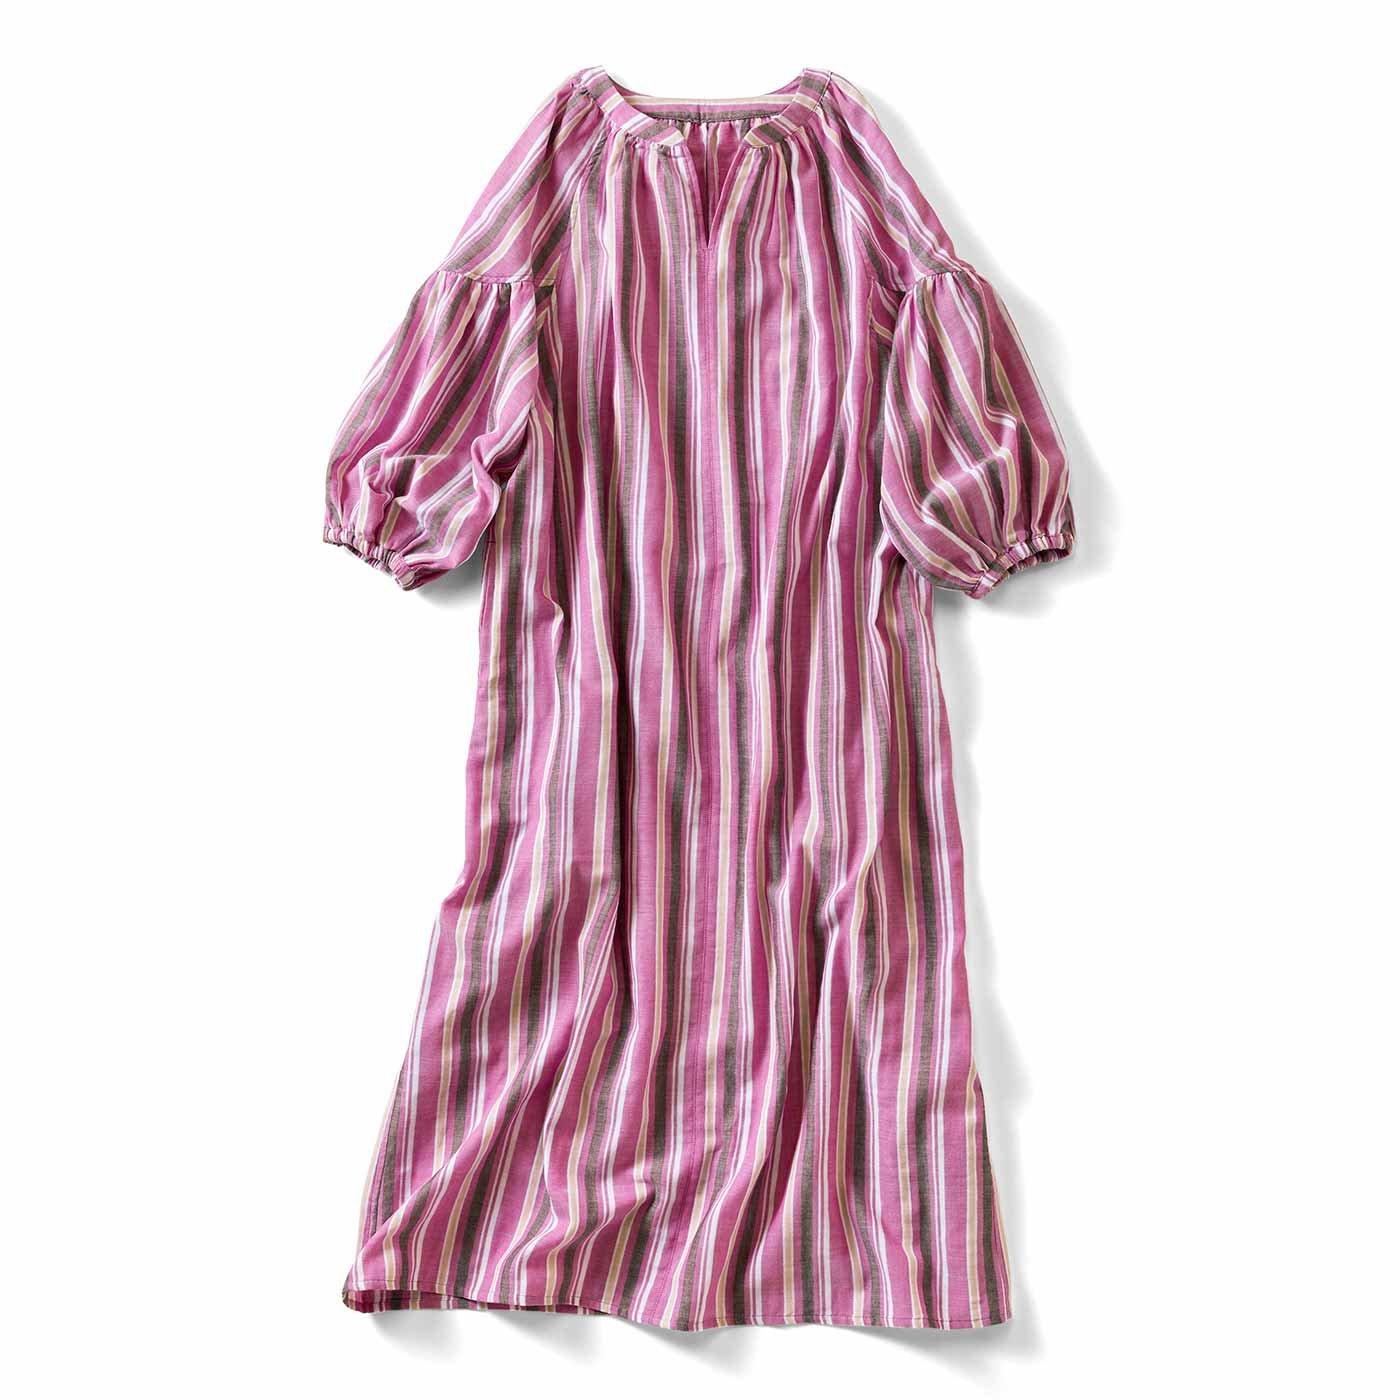 IEDIT[イディット] 先染めマルチストライプのダブルガーゼロングドレス〈ピンク〉